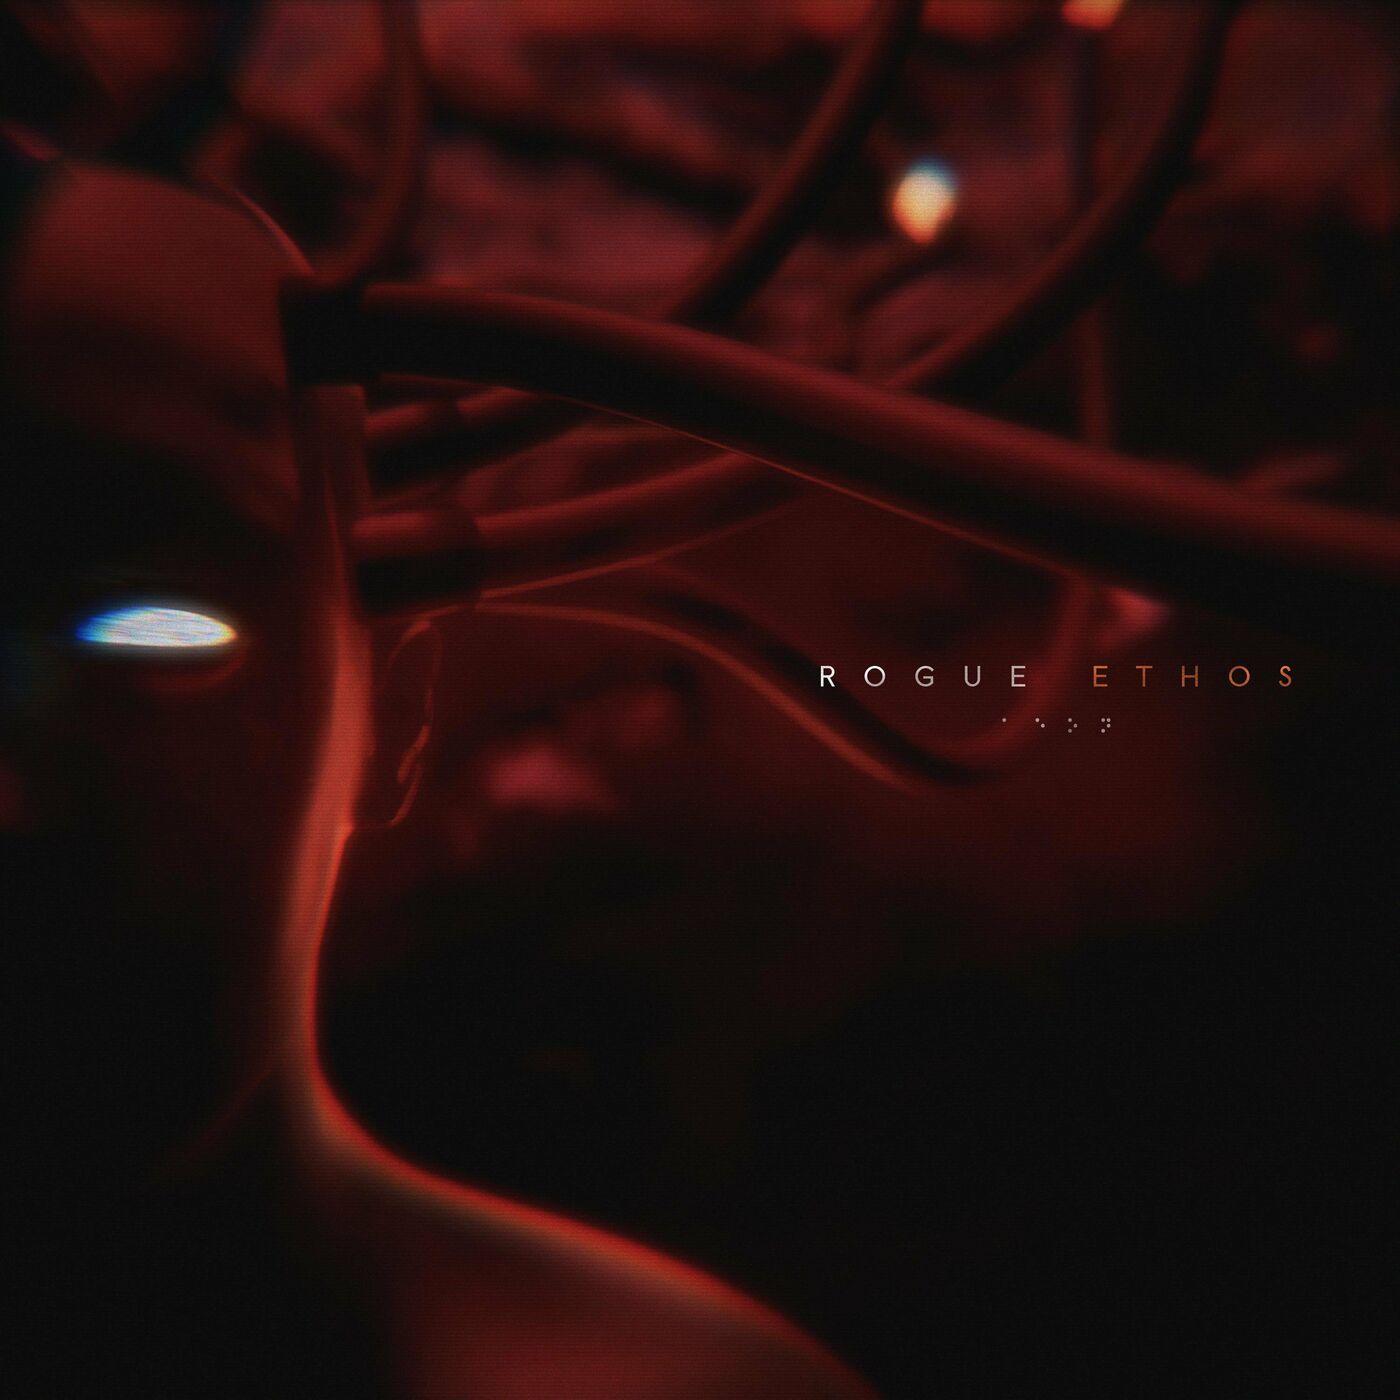 RoGue - Ethos [single] (2020)